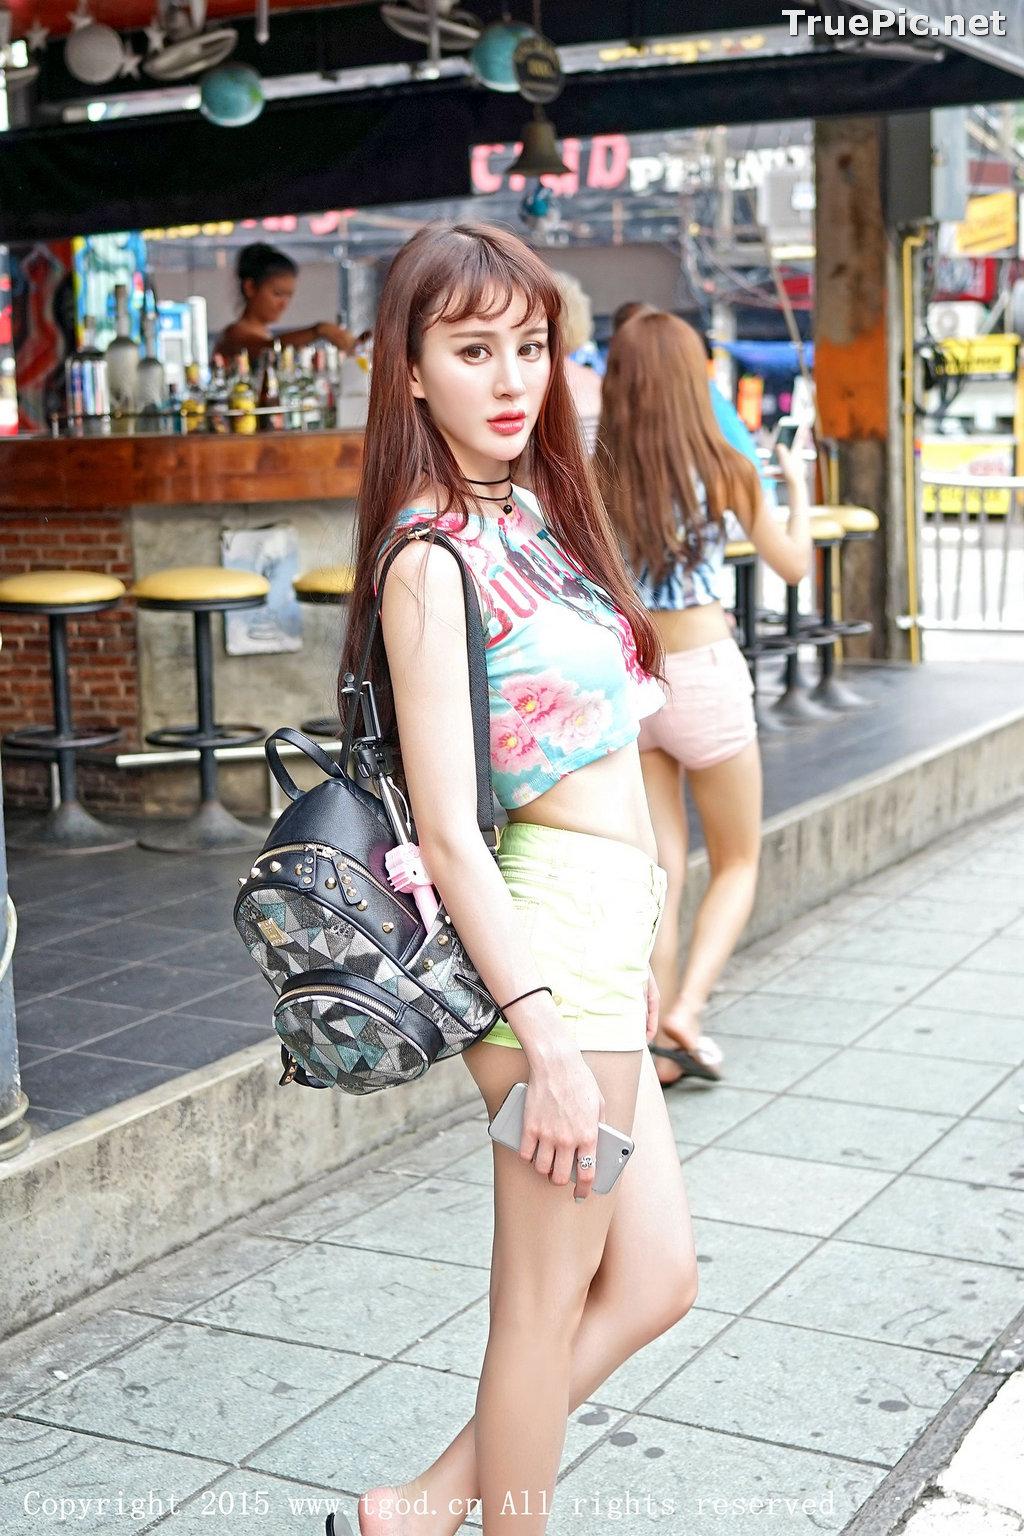 Image TGOD 2015-12-03 - Chinese Model - Cheryl (青树) - TruePic.net - Picture-3